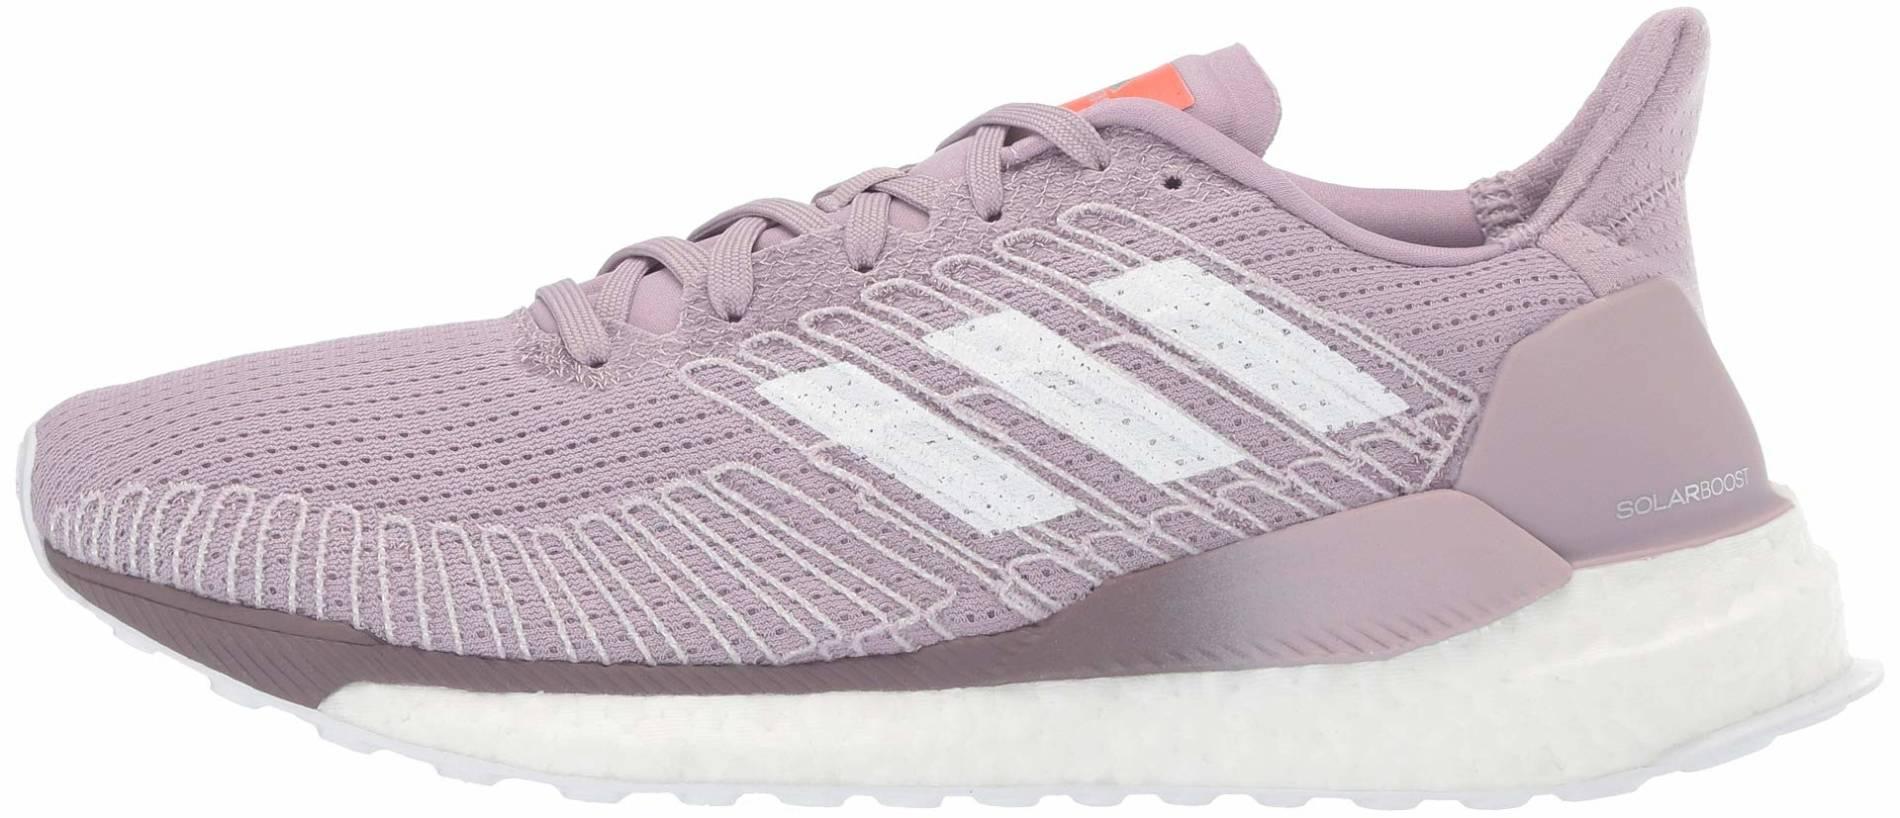 50 Purple running shoes - Save 28%   RunRepeat